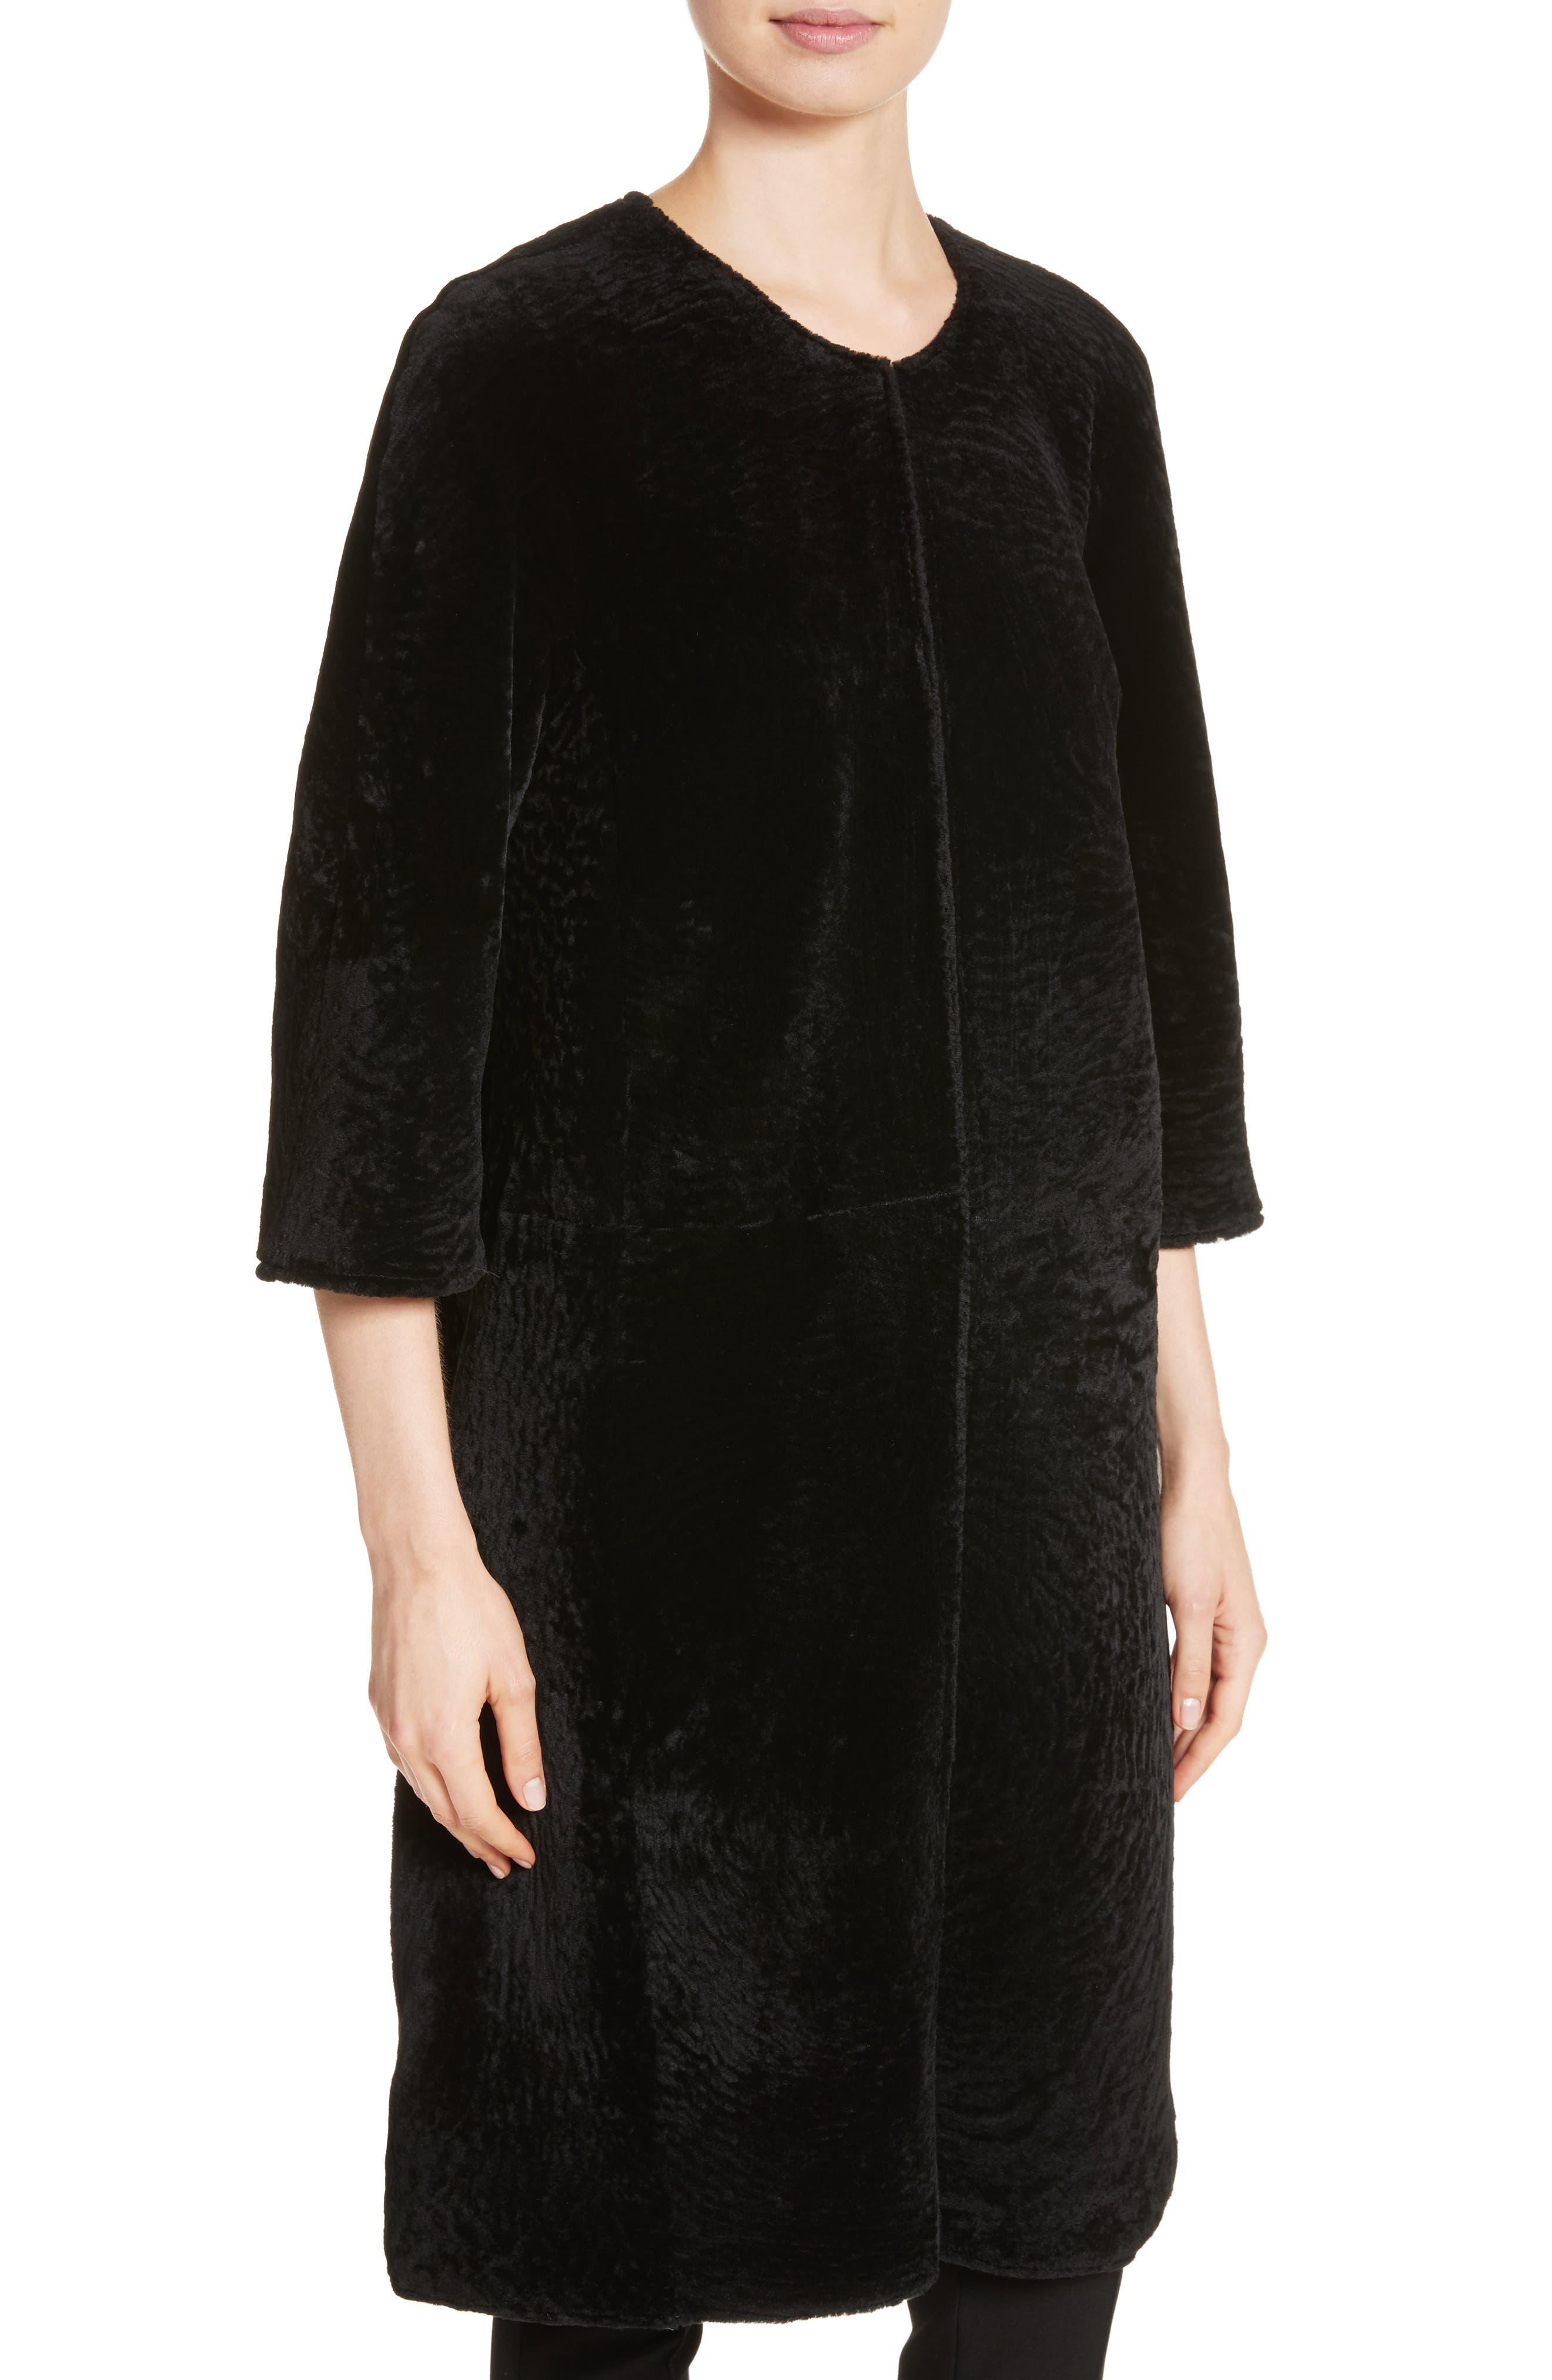 Alternate Image 3  - St. John Collection Genuine Textured Lamb Fur Jacket